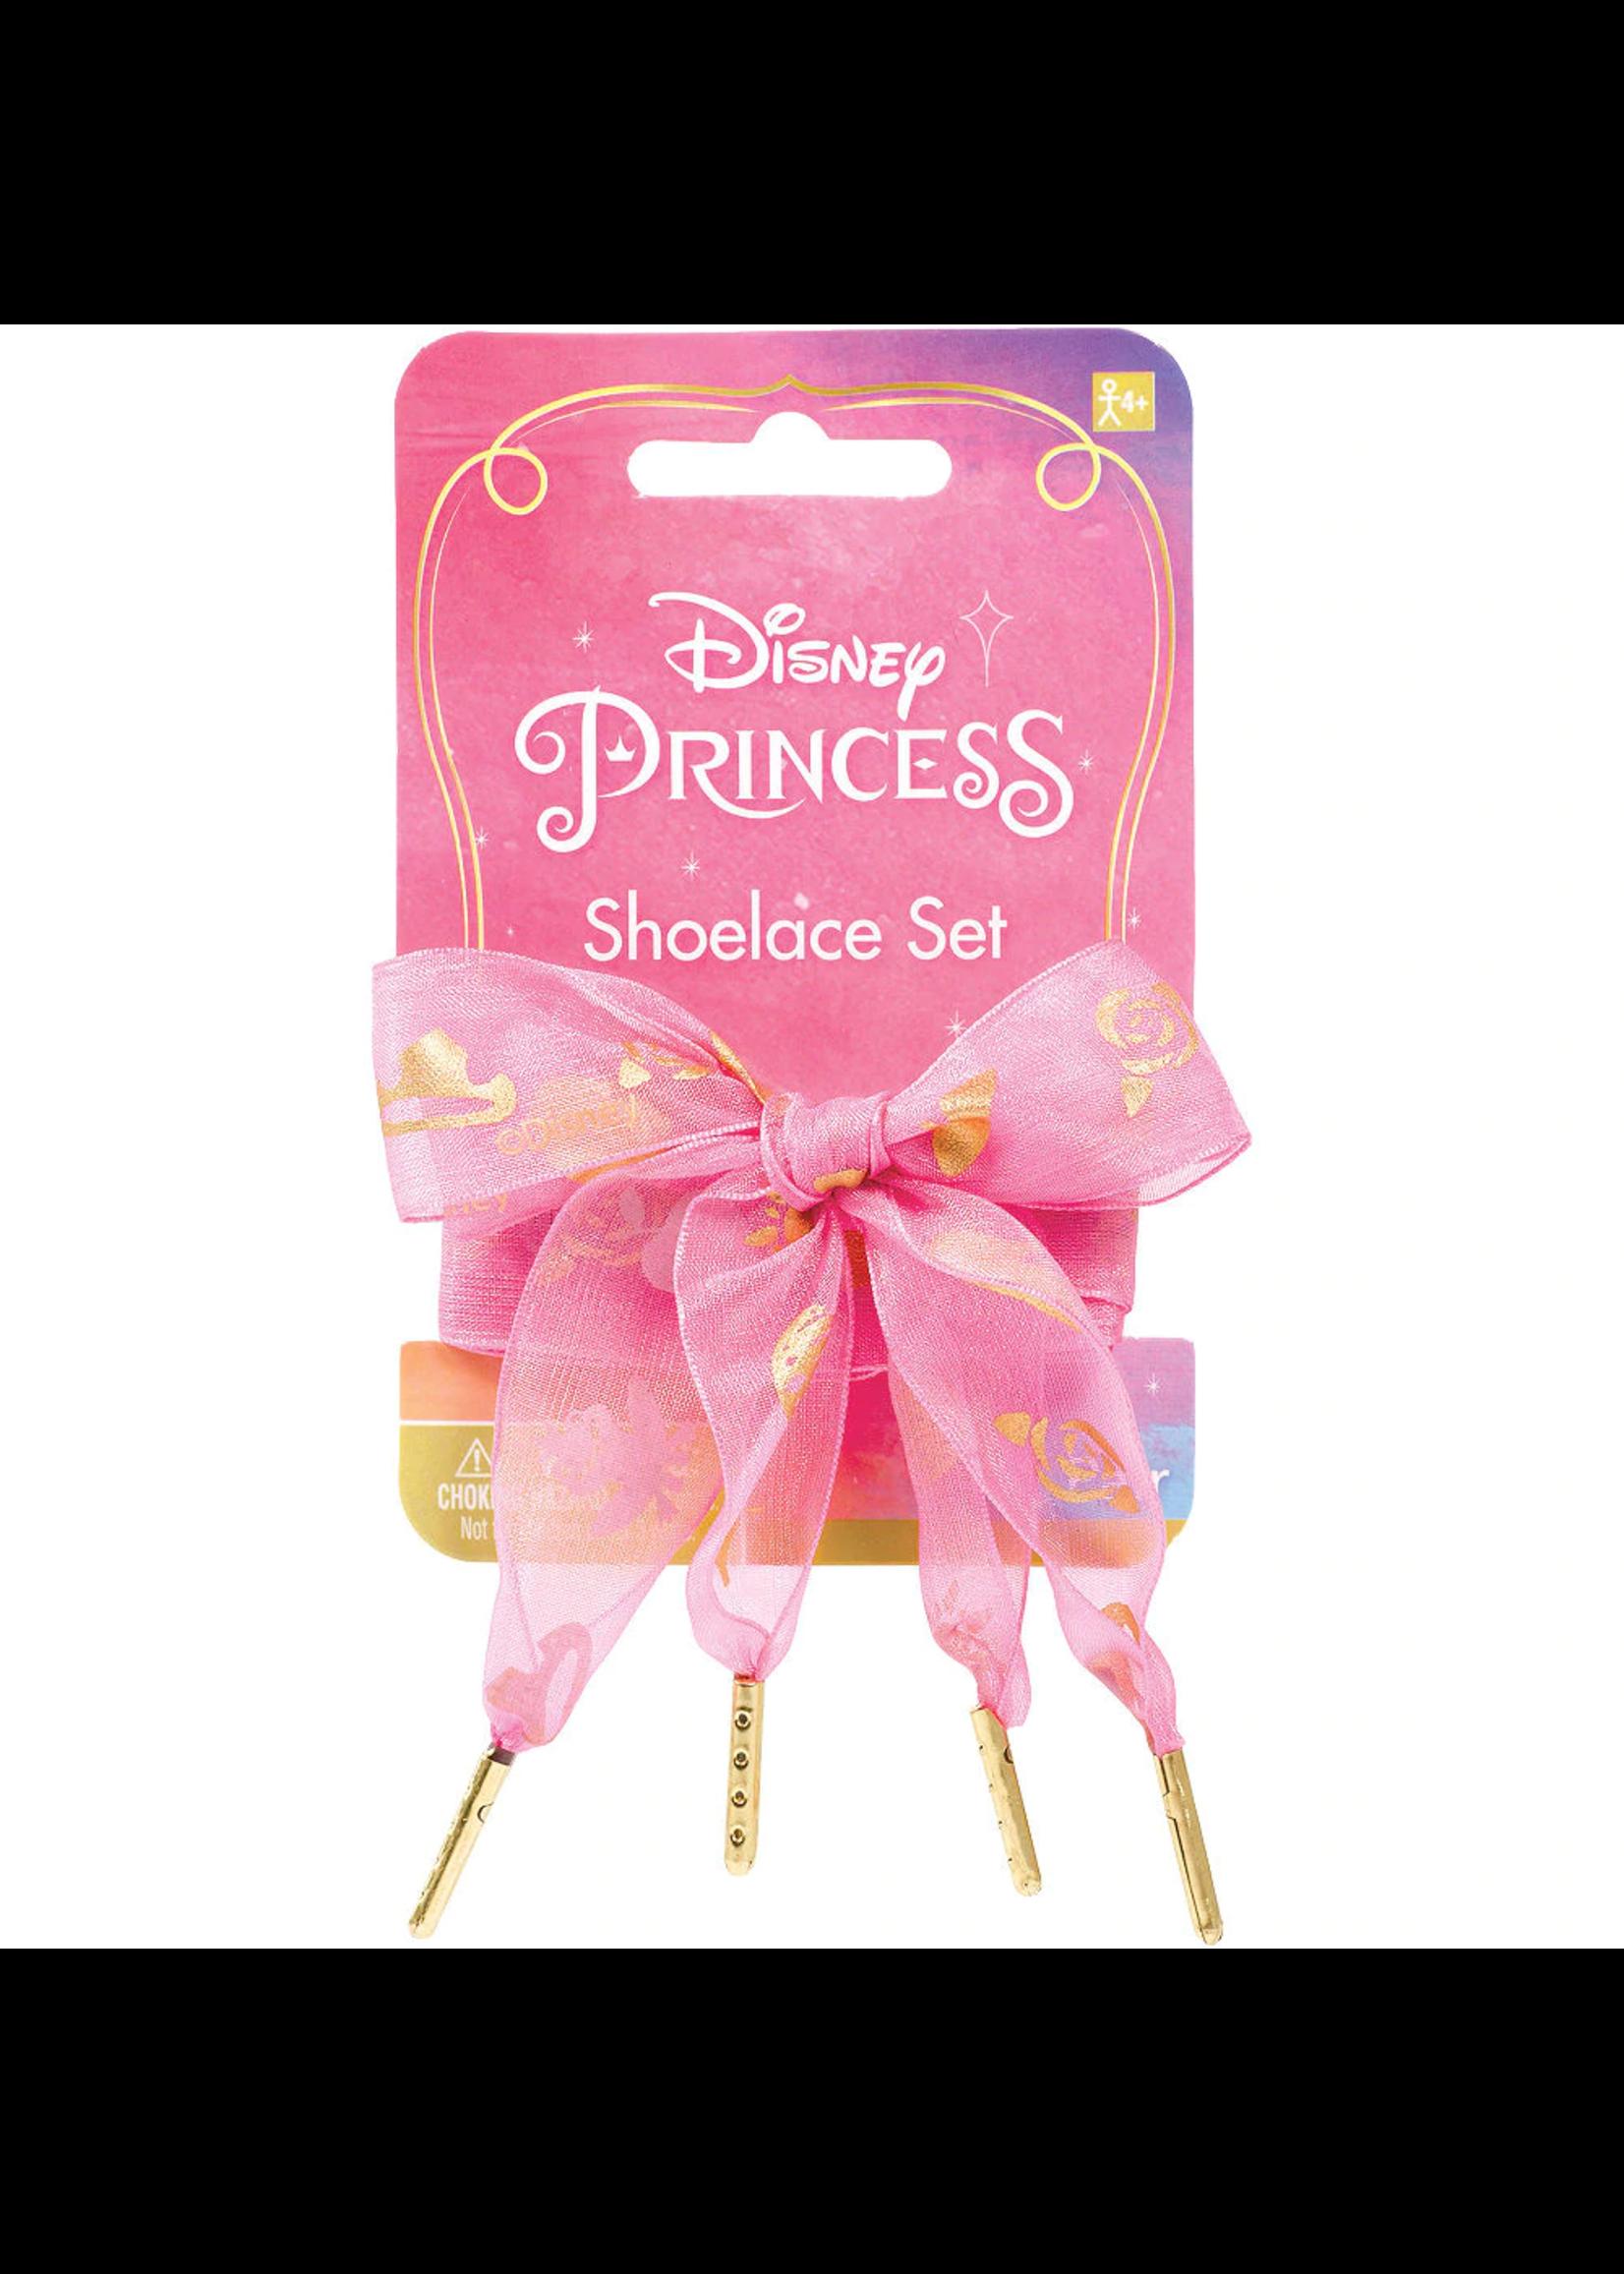 Disney Princess Once Upon a Time Shoe Laces